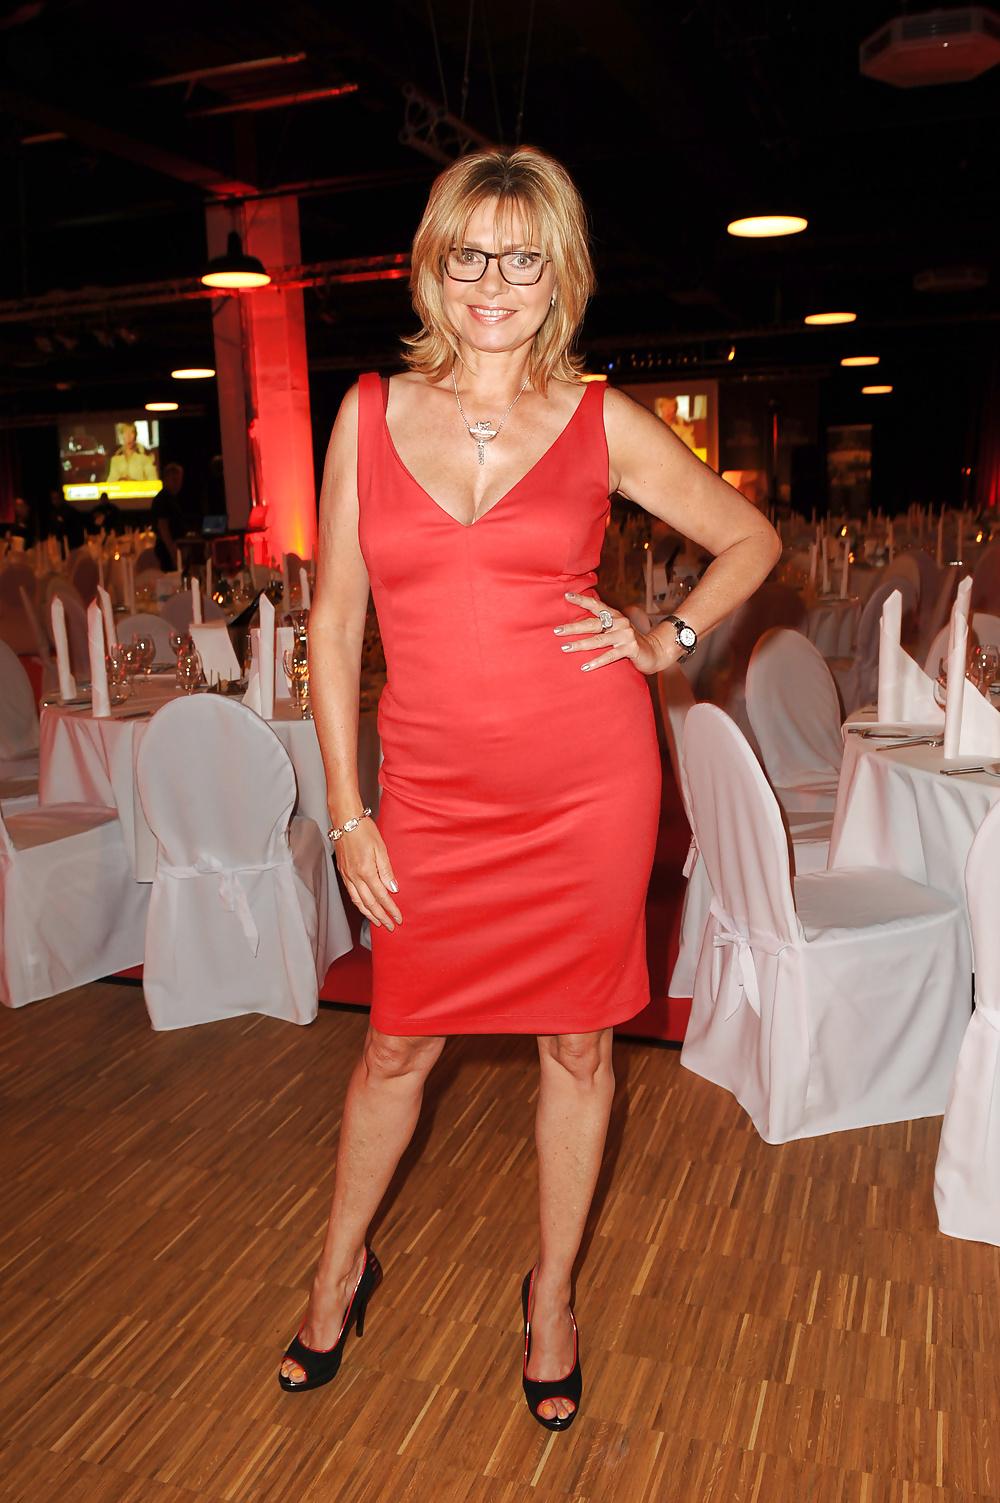 Elegant Mature Amateur Ladies Fully Clothed3 - 29 Pics -3164